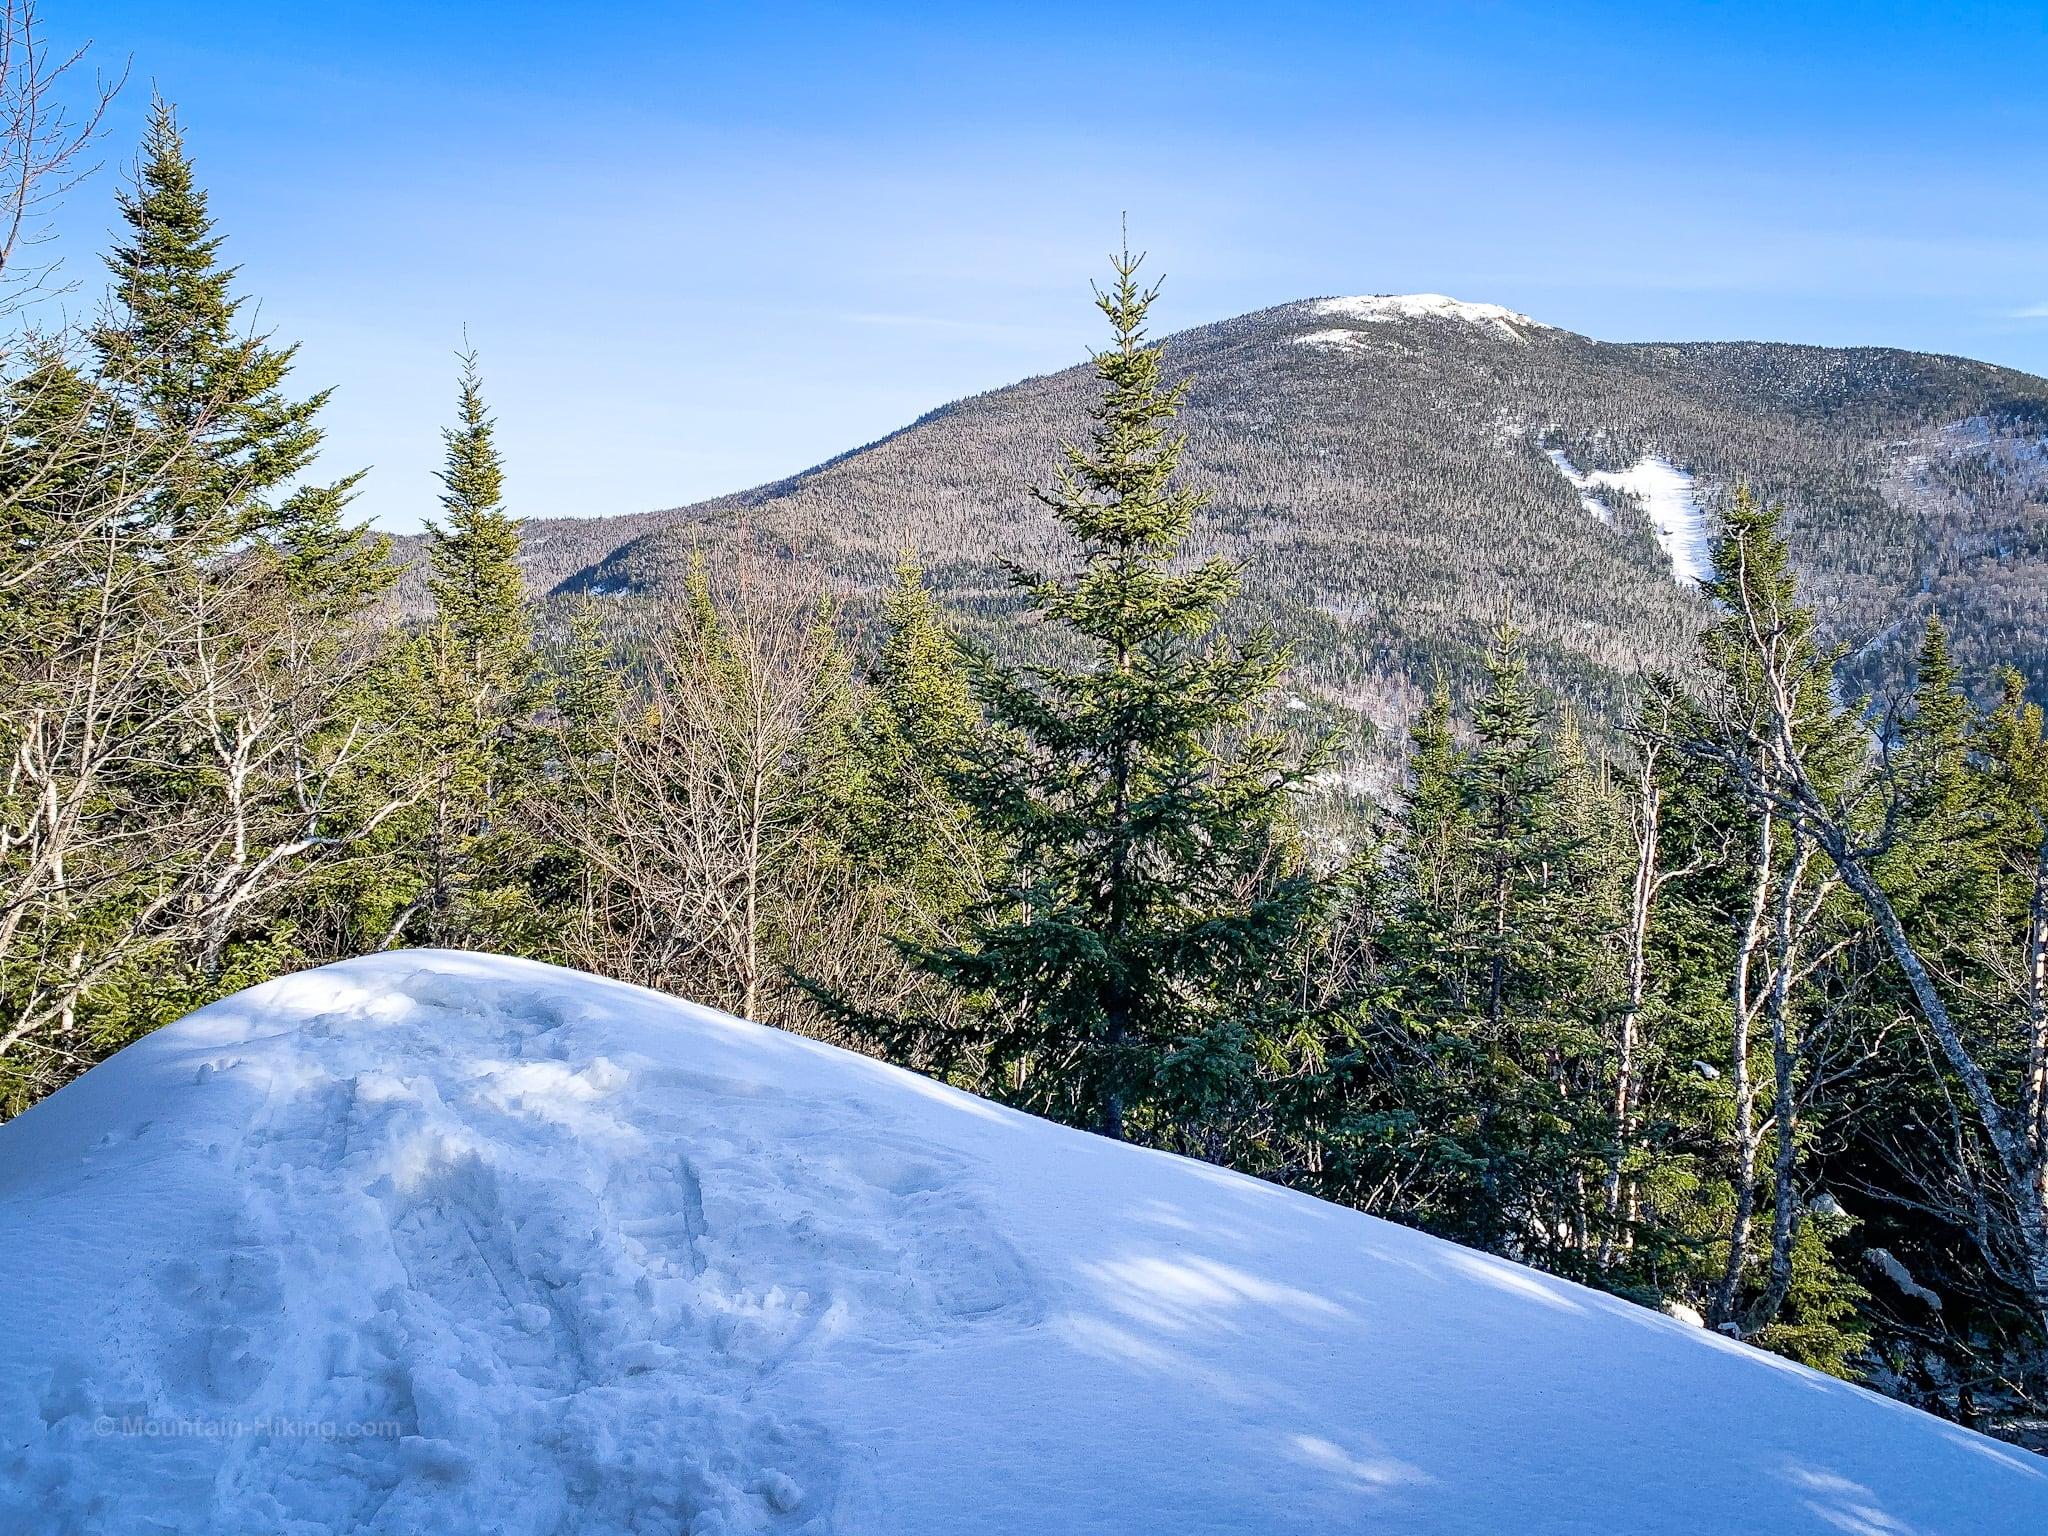 snowy mountain lookout